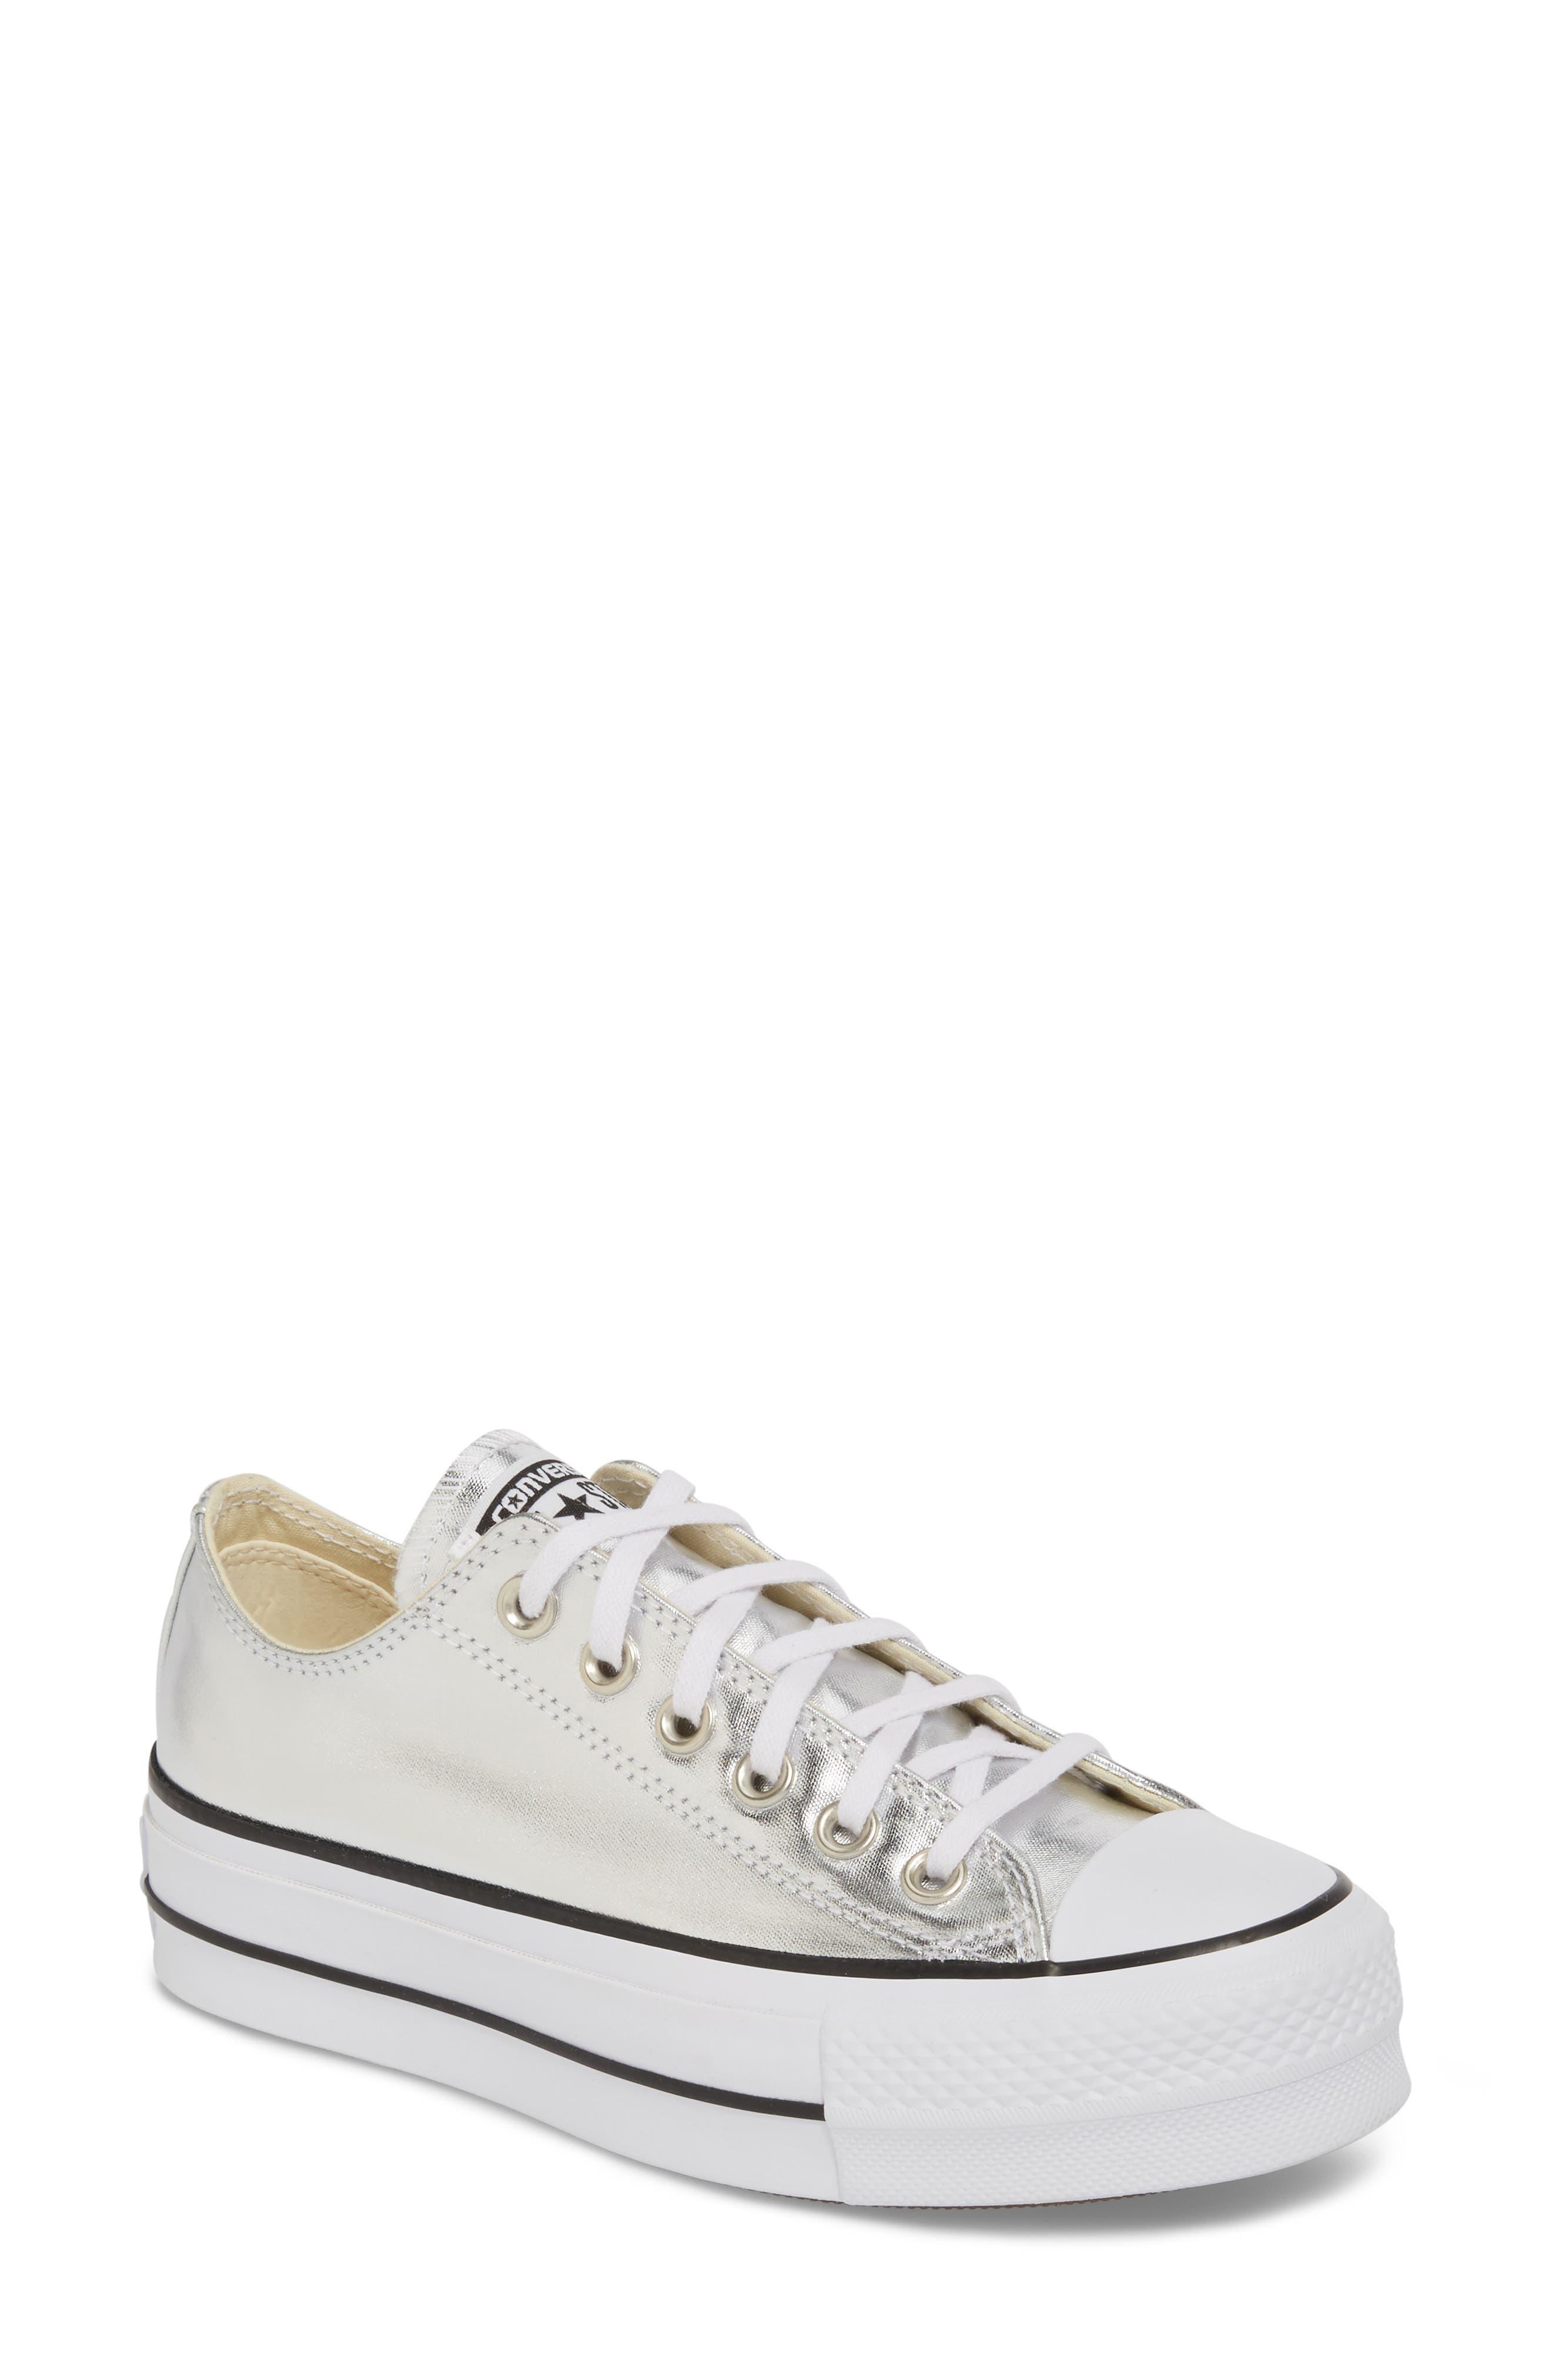 Chuck Taylor<sup>®</sup> All Star Platform Sneaker,                         Main,                         color, Silver/ Black